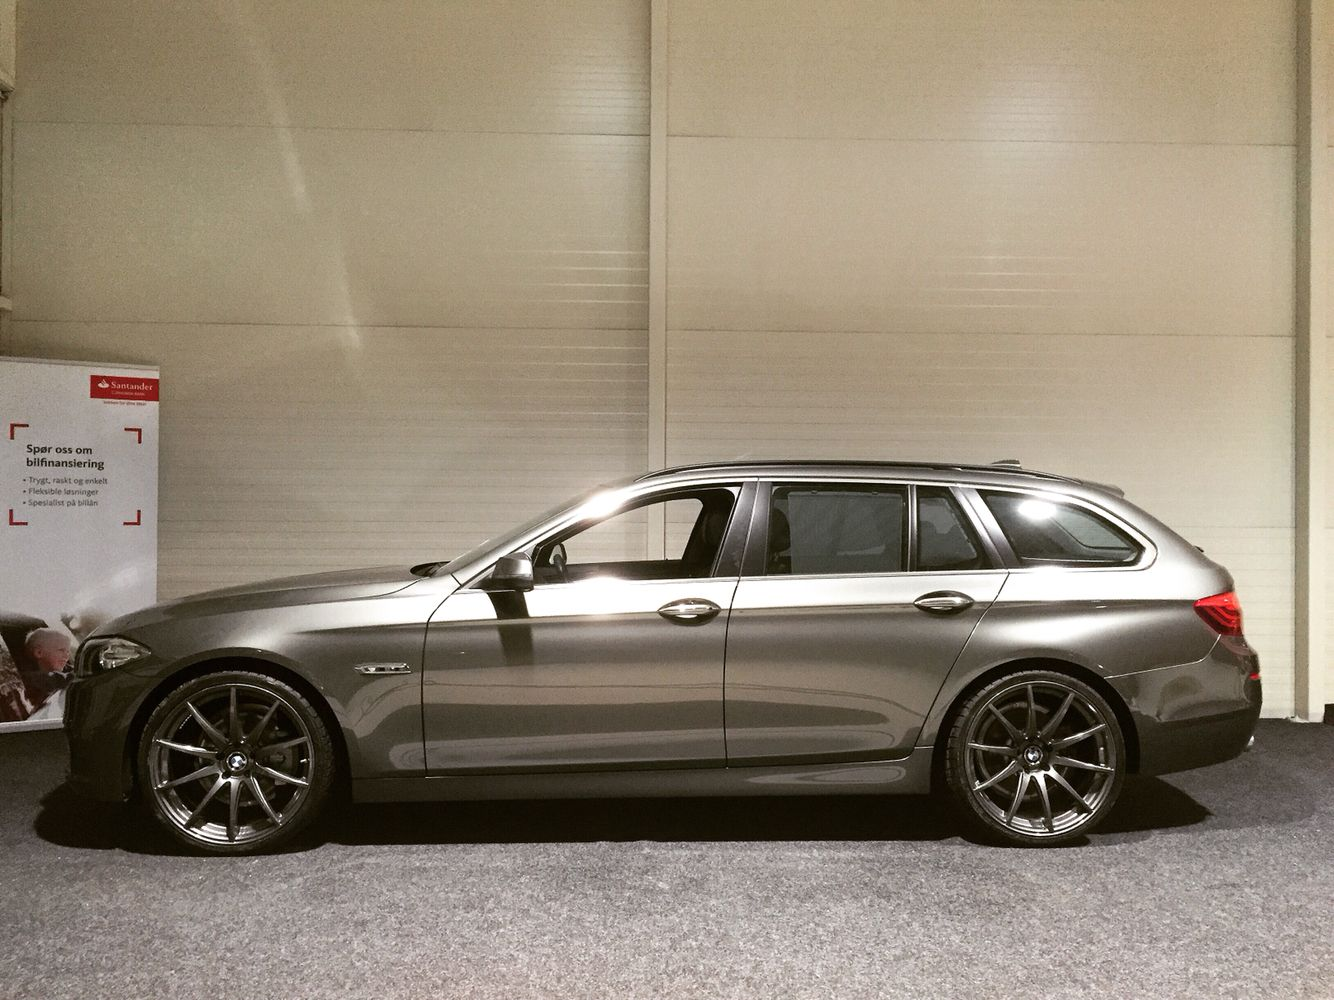 Bmw F11 With 21 Gs Concours Wheels Auto1premium Auto 1 Premium